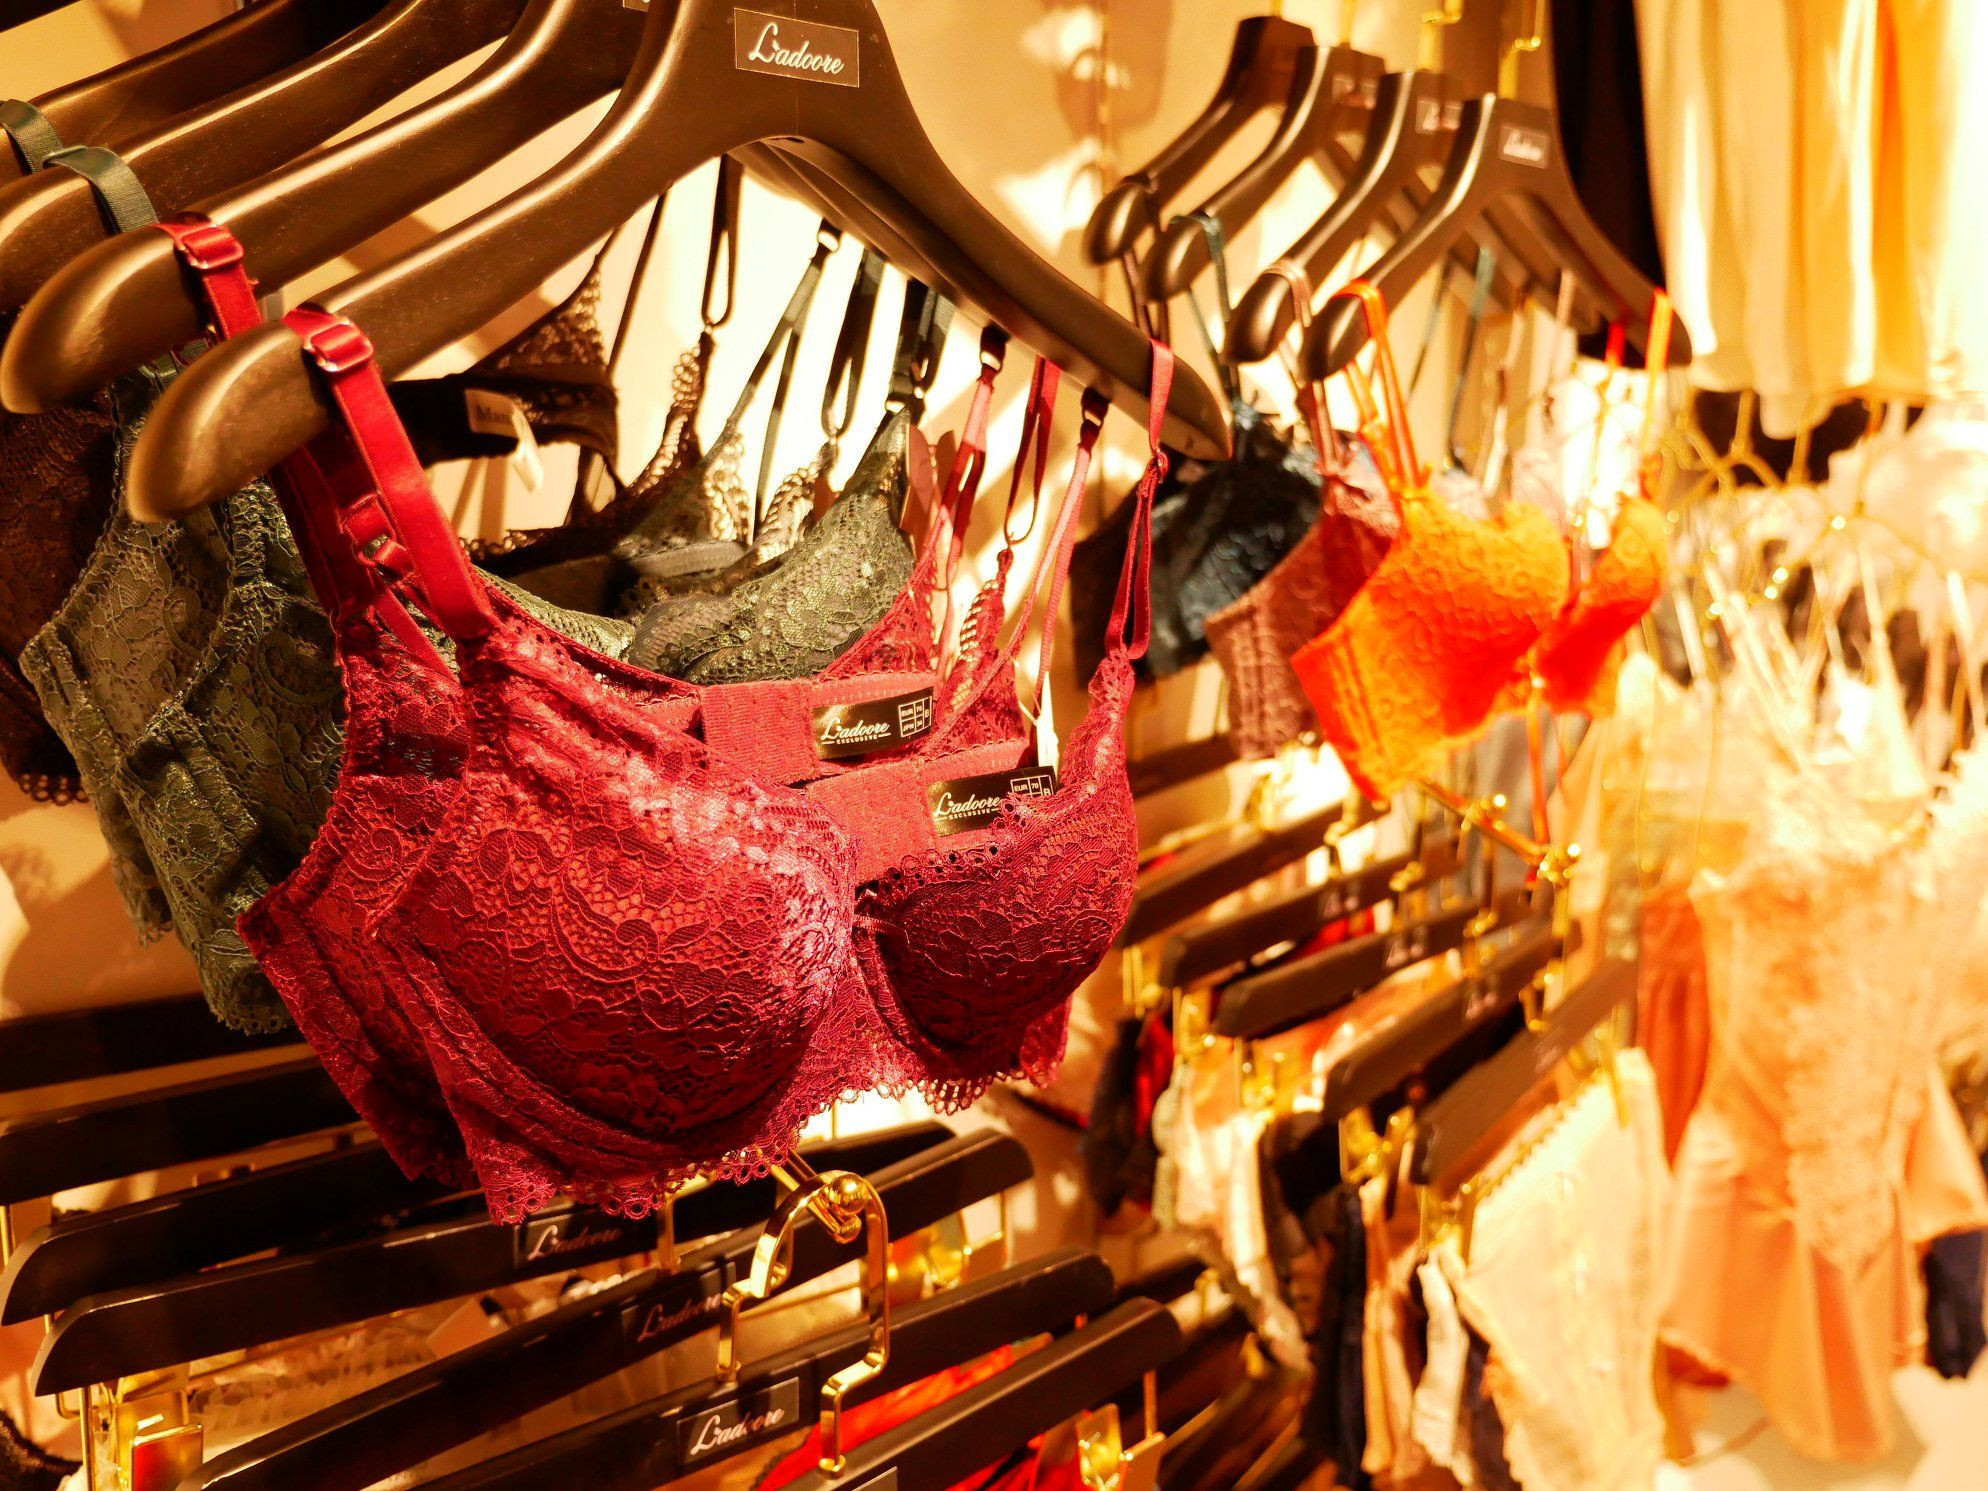 Women's Lingerie, Underwear, Panties, Bra Set, Swimwear, Invisible bra, Pajamas and Sleepwear Wholesale From Taiwan